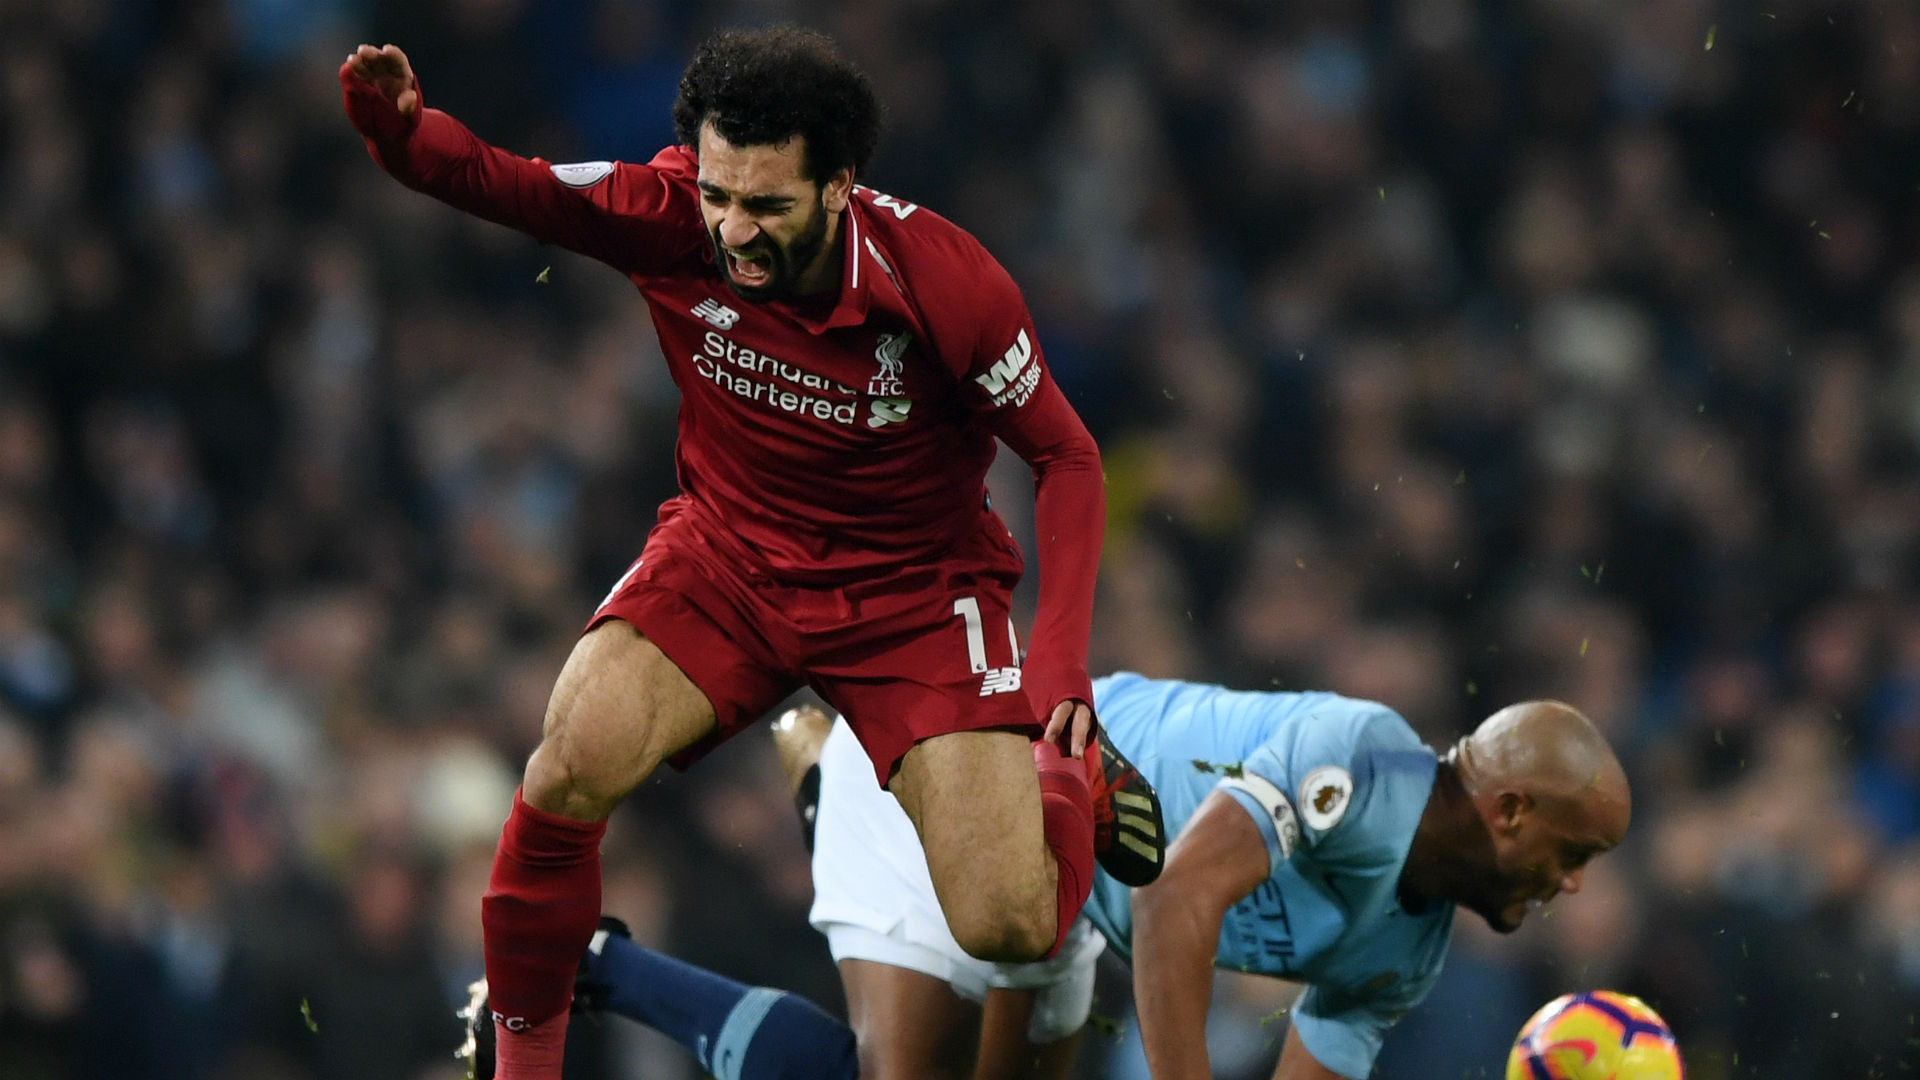 Mohamed Salah Vincent Kompany Manchester City Liverpool Premier League 03012019